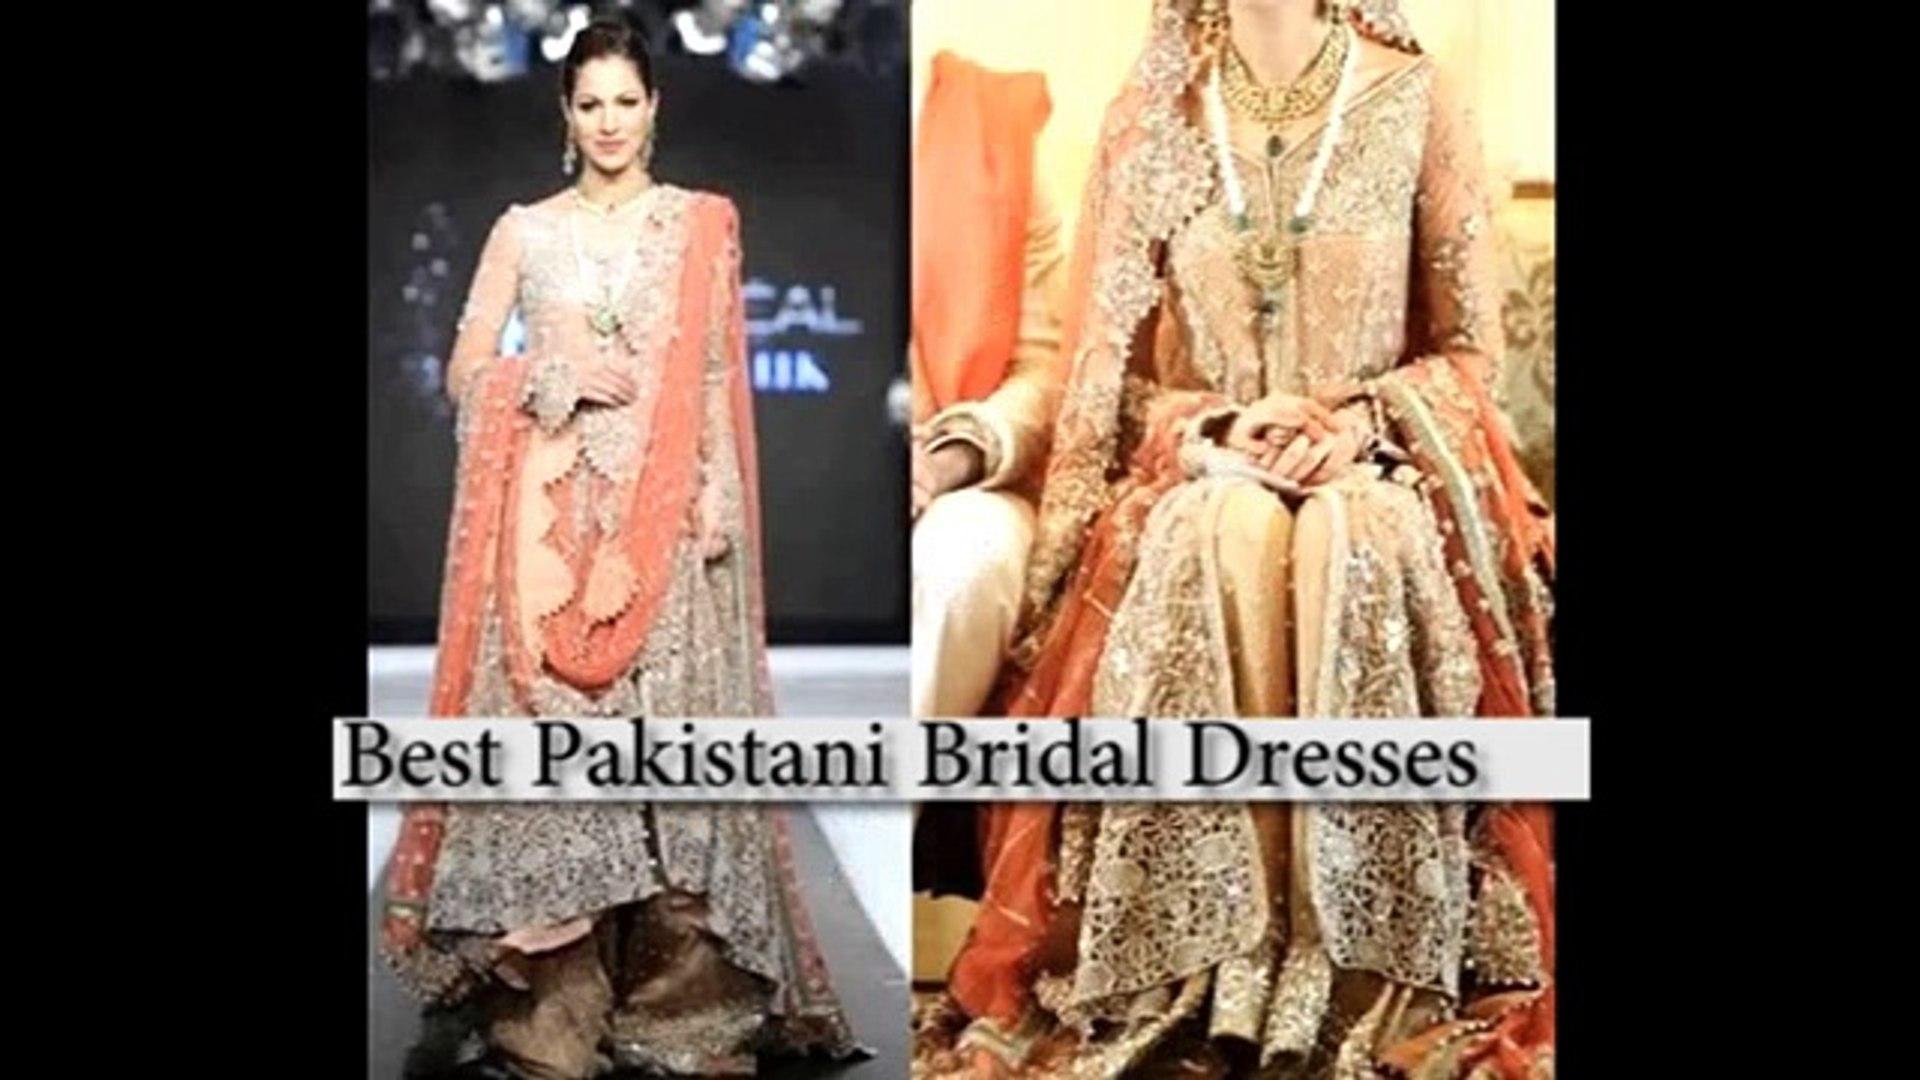 Pakistan Wedding Dresses 2016 Pakistani Bridal Dresses 2016 top songs 2016 best songs new songs upco